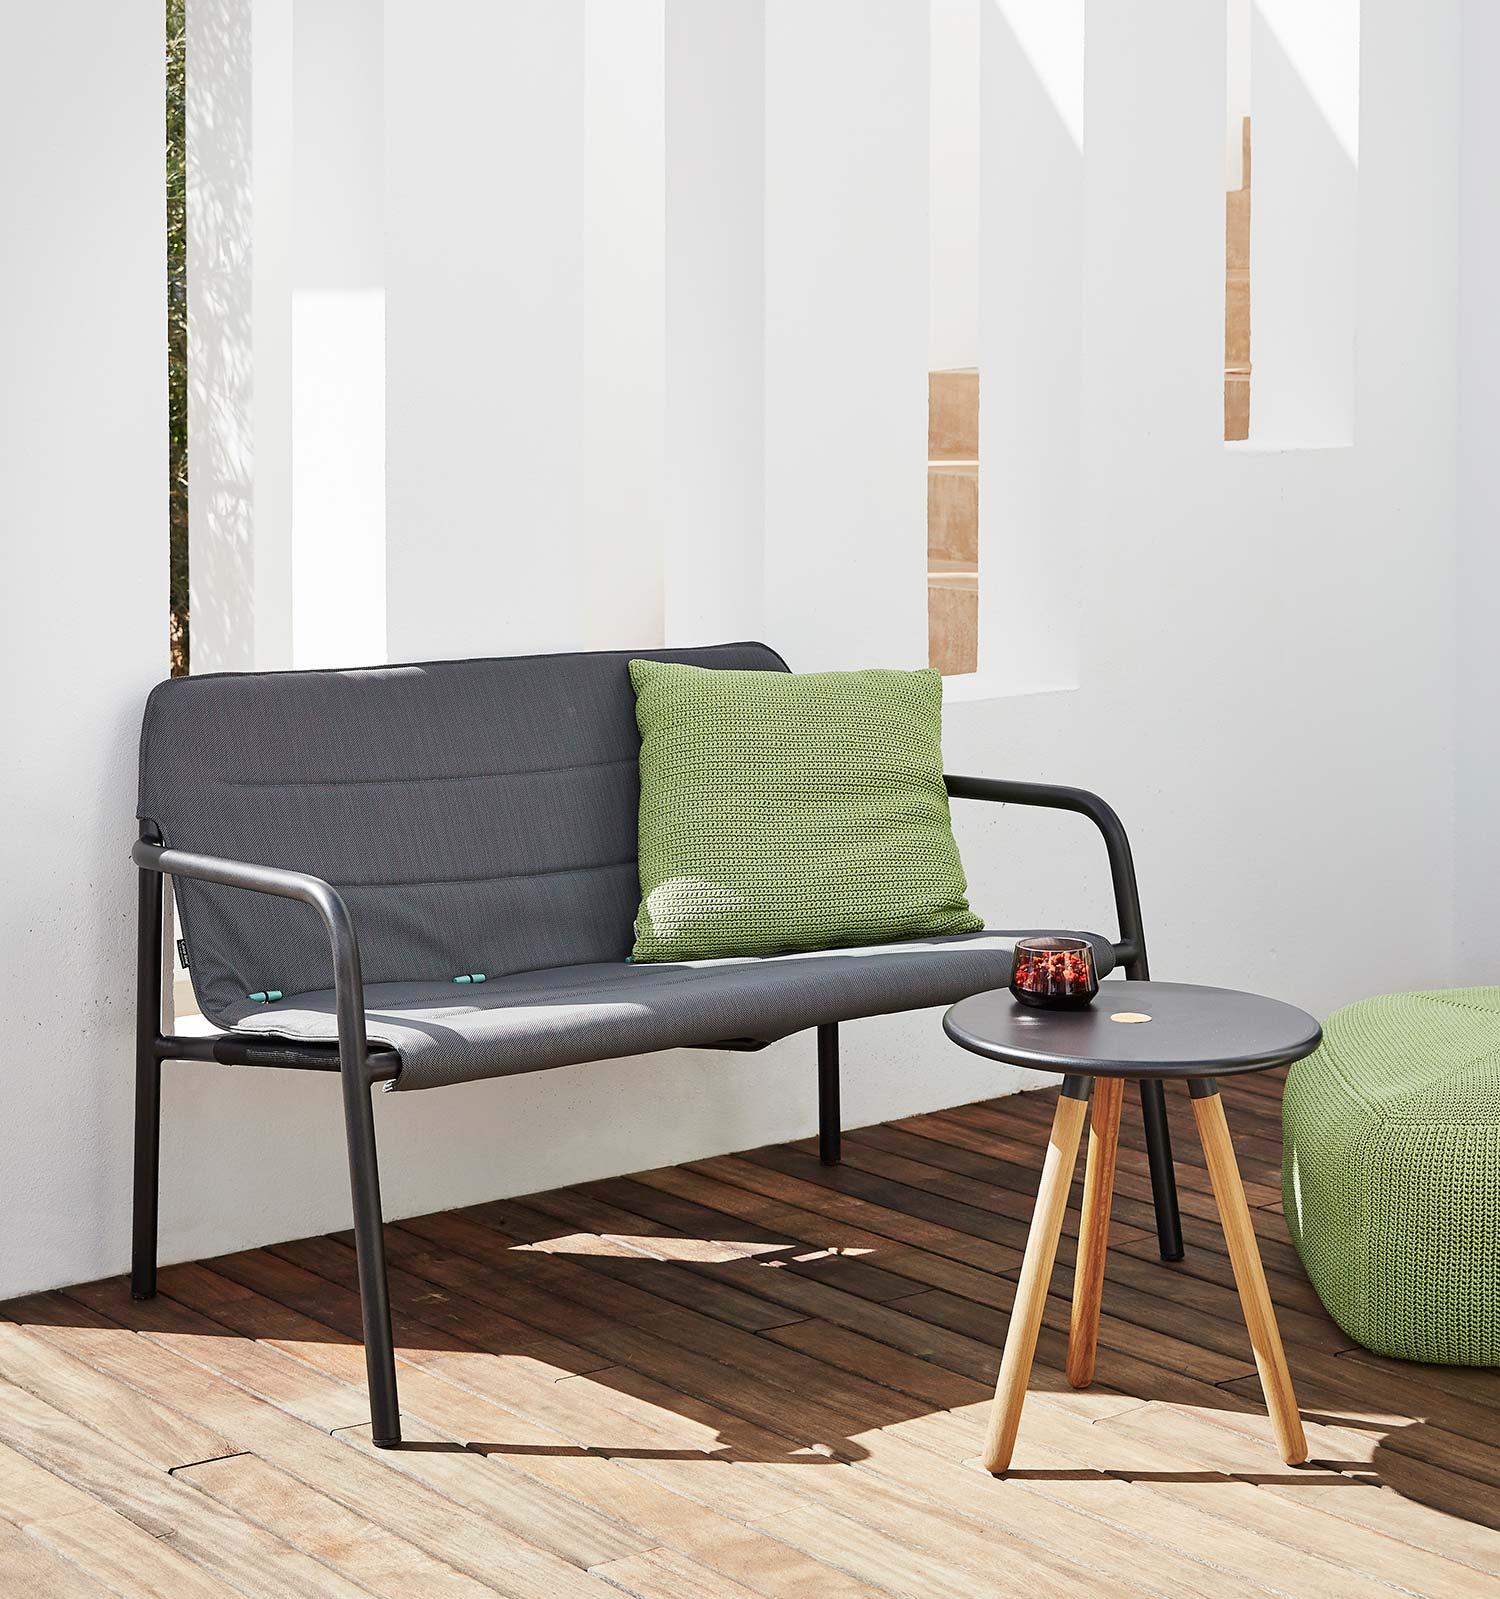 Kapa lounge soffa från Cane-line.